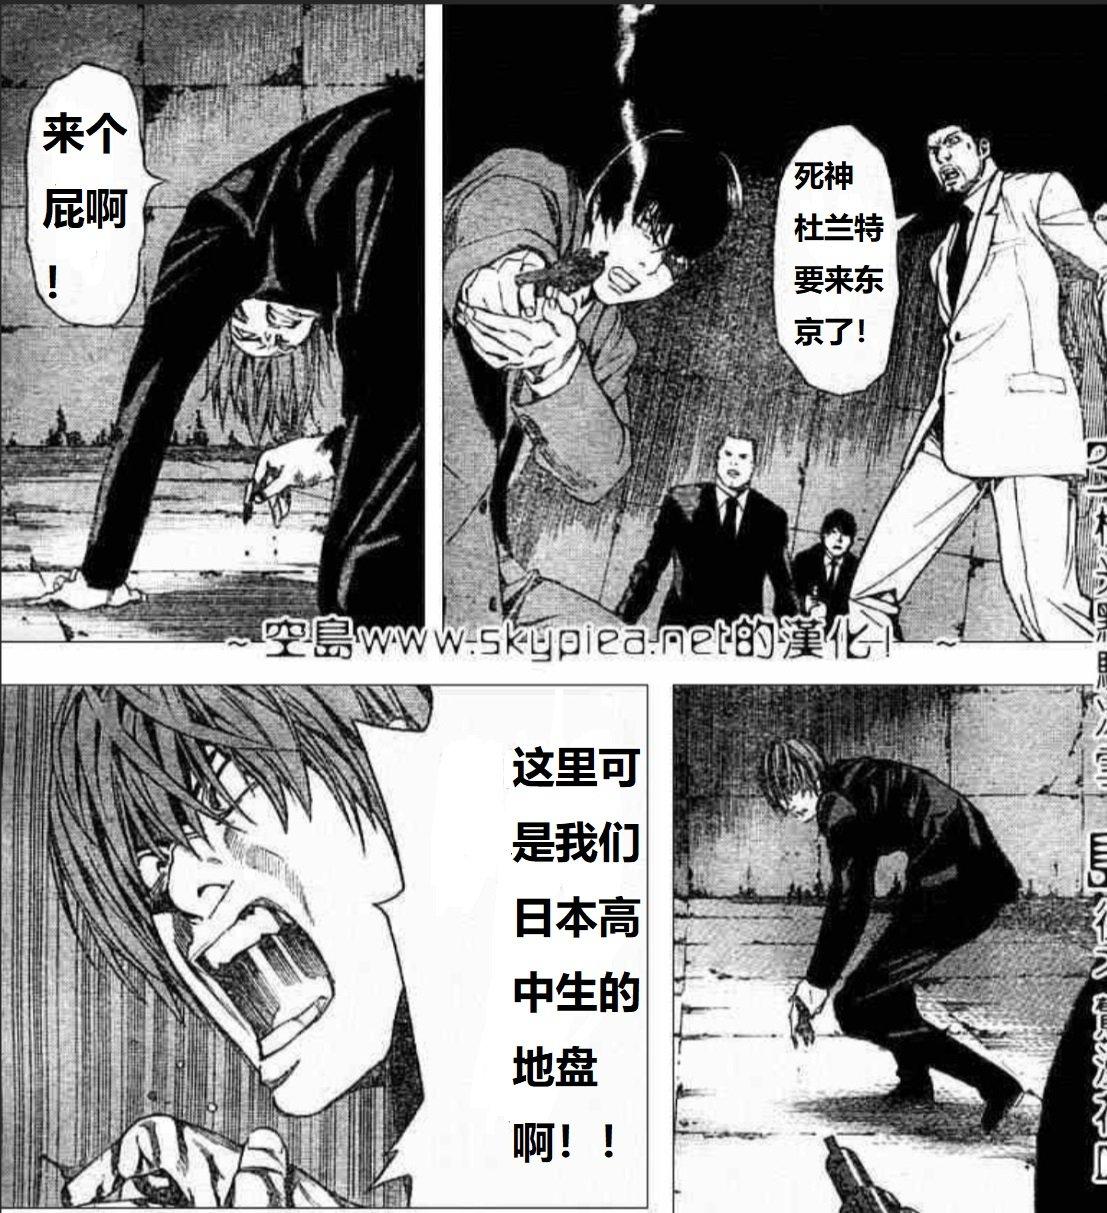 网页捕获_25-7-2021_222315_www.mangabz.com.jpeg